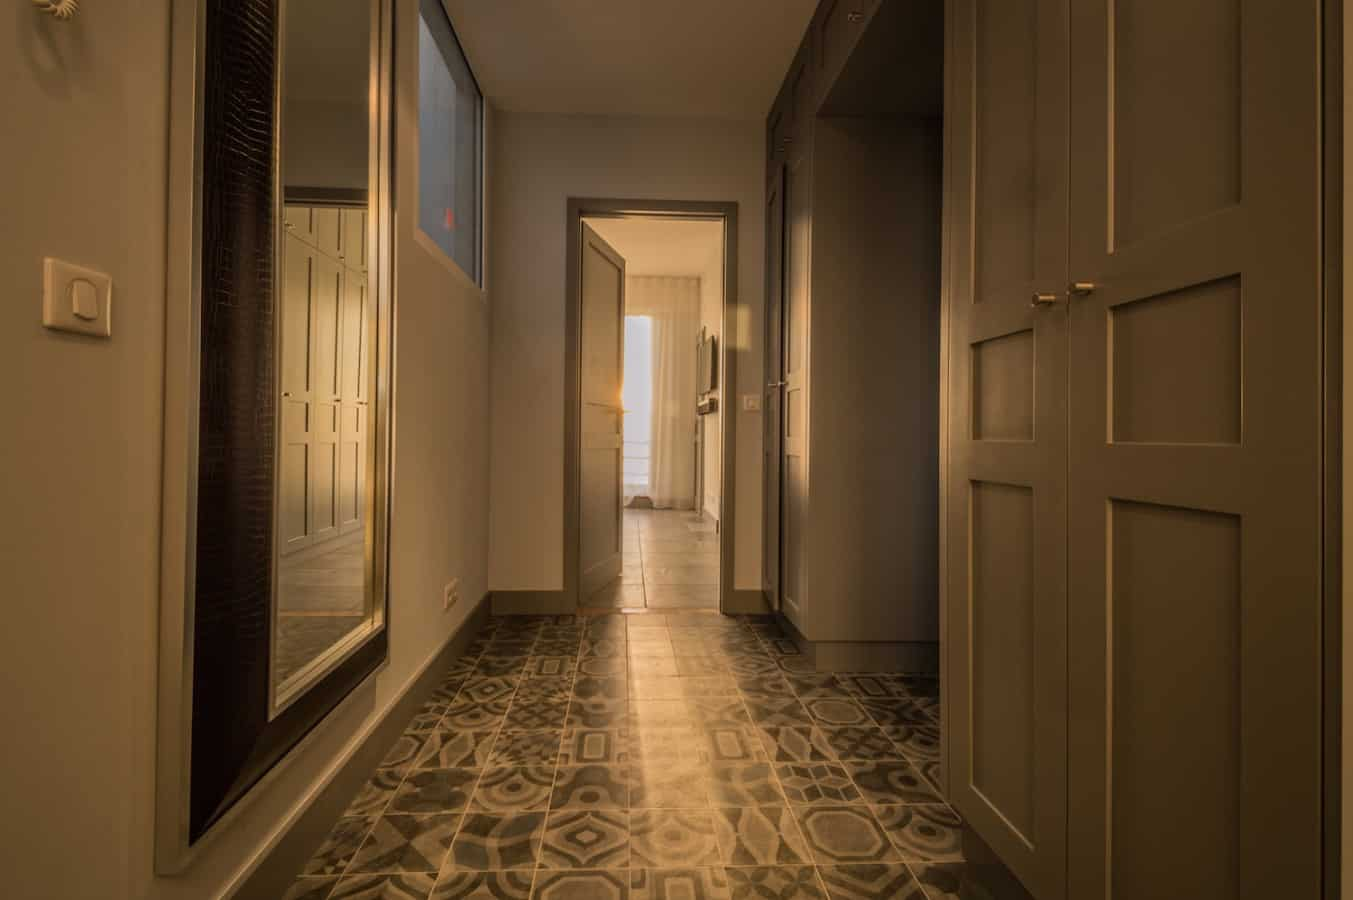 couloir penthouse nice architecte luxoria - Luxoria Interiors, un cabinet d' architecte haut de gamme